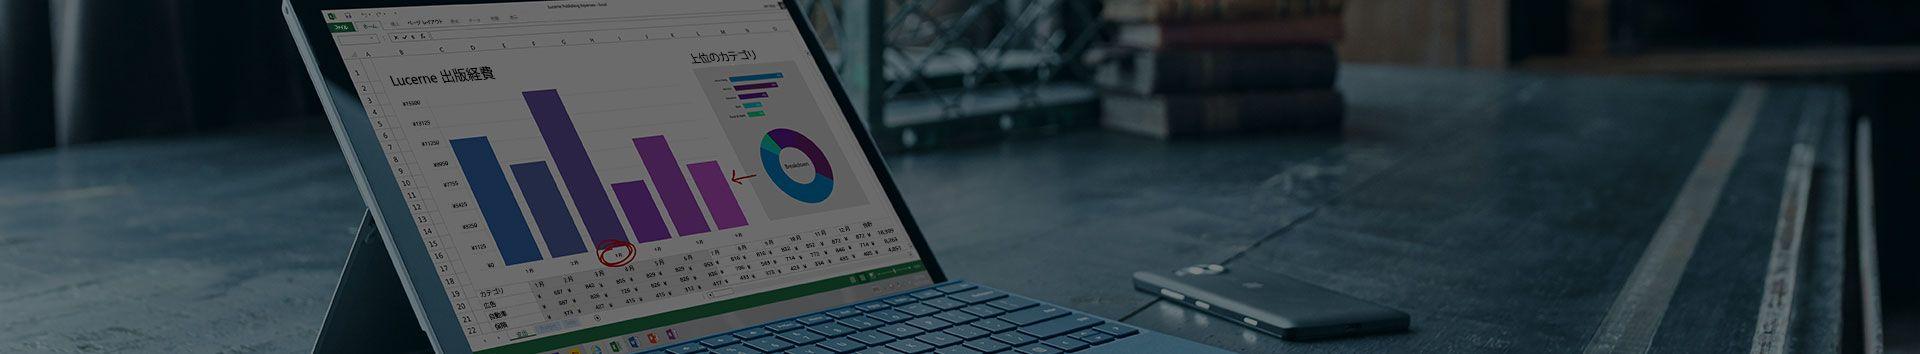 Microsoft Surface タブレットに Microsoft Excel の経費報告書が表示されています